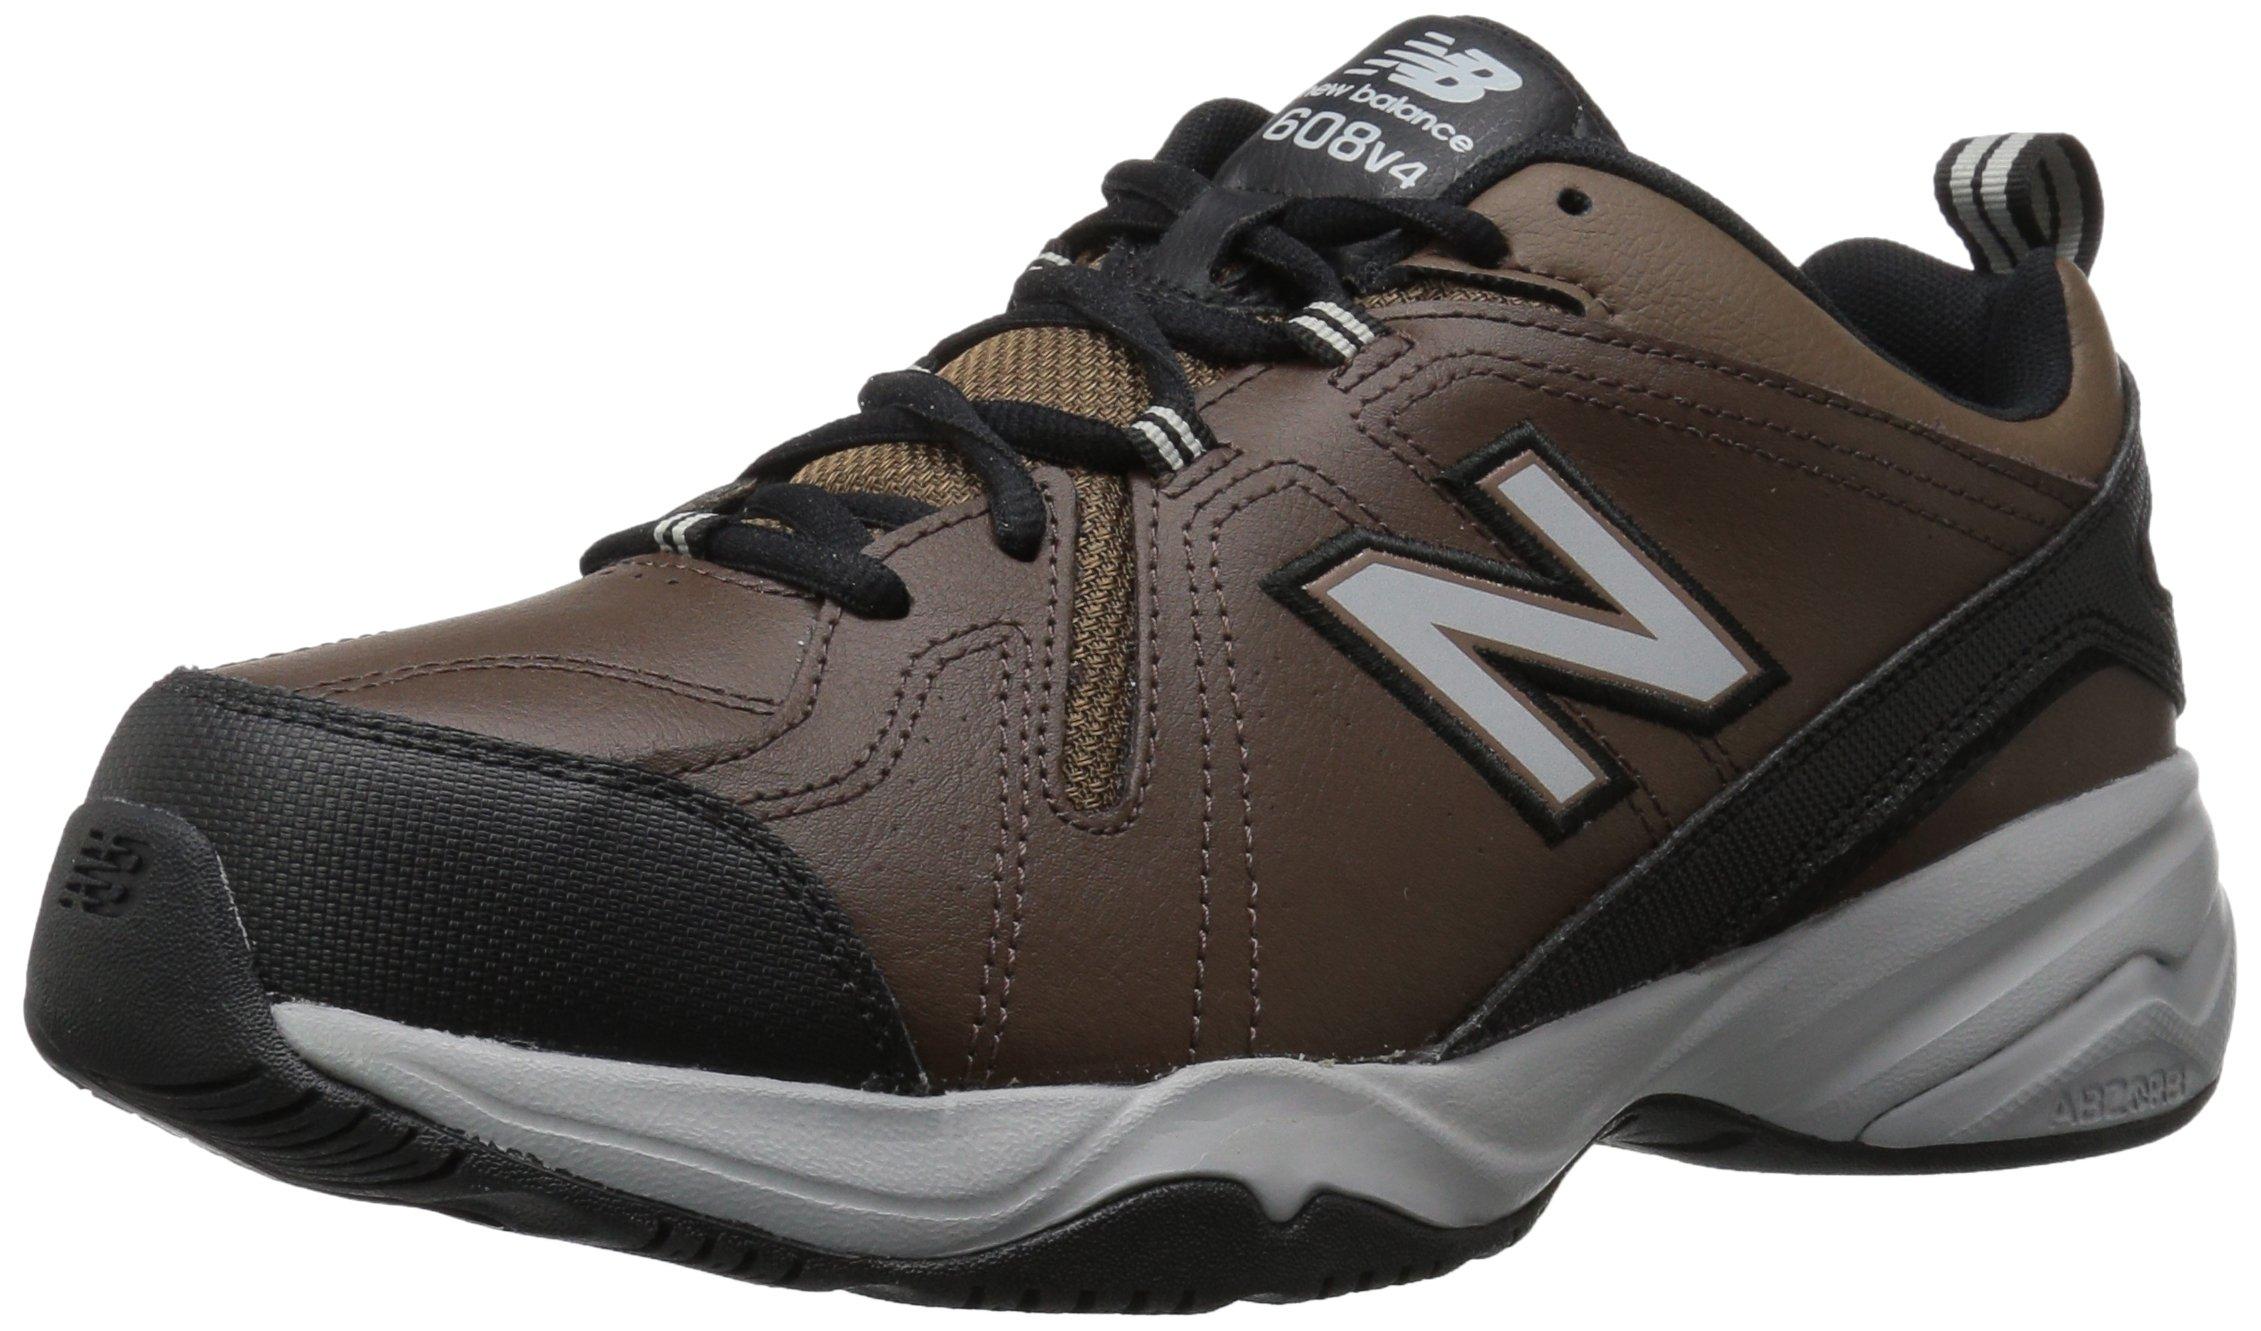 New Balance Men's MX608v4 Training Shoe, Chocolate Brown, 7.5 4E US